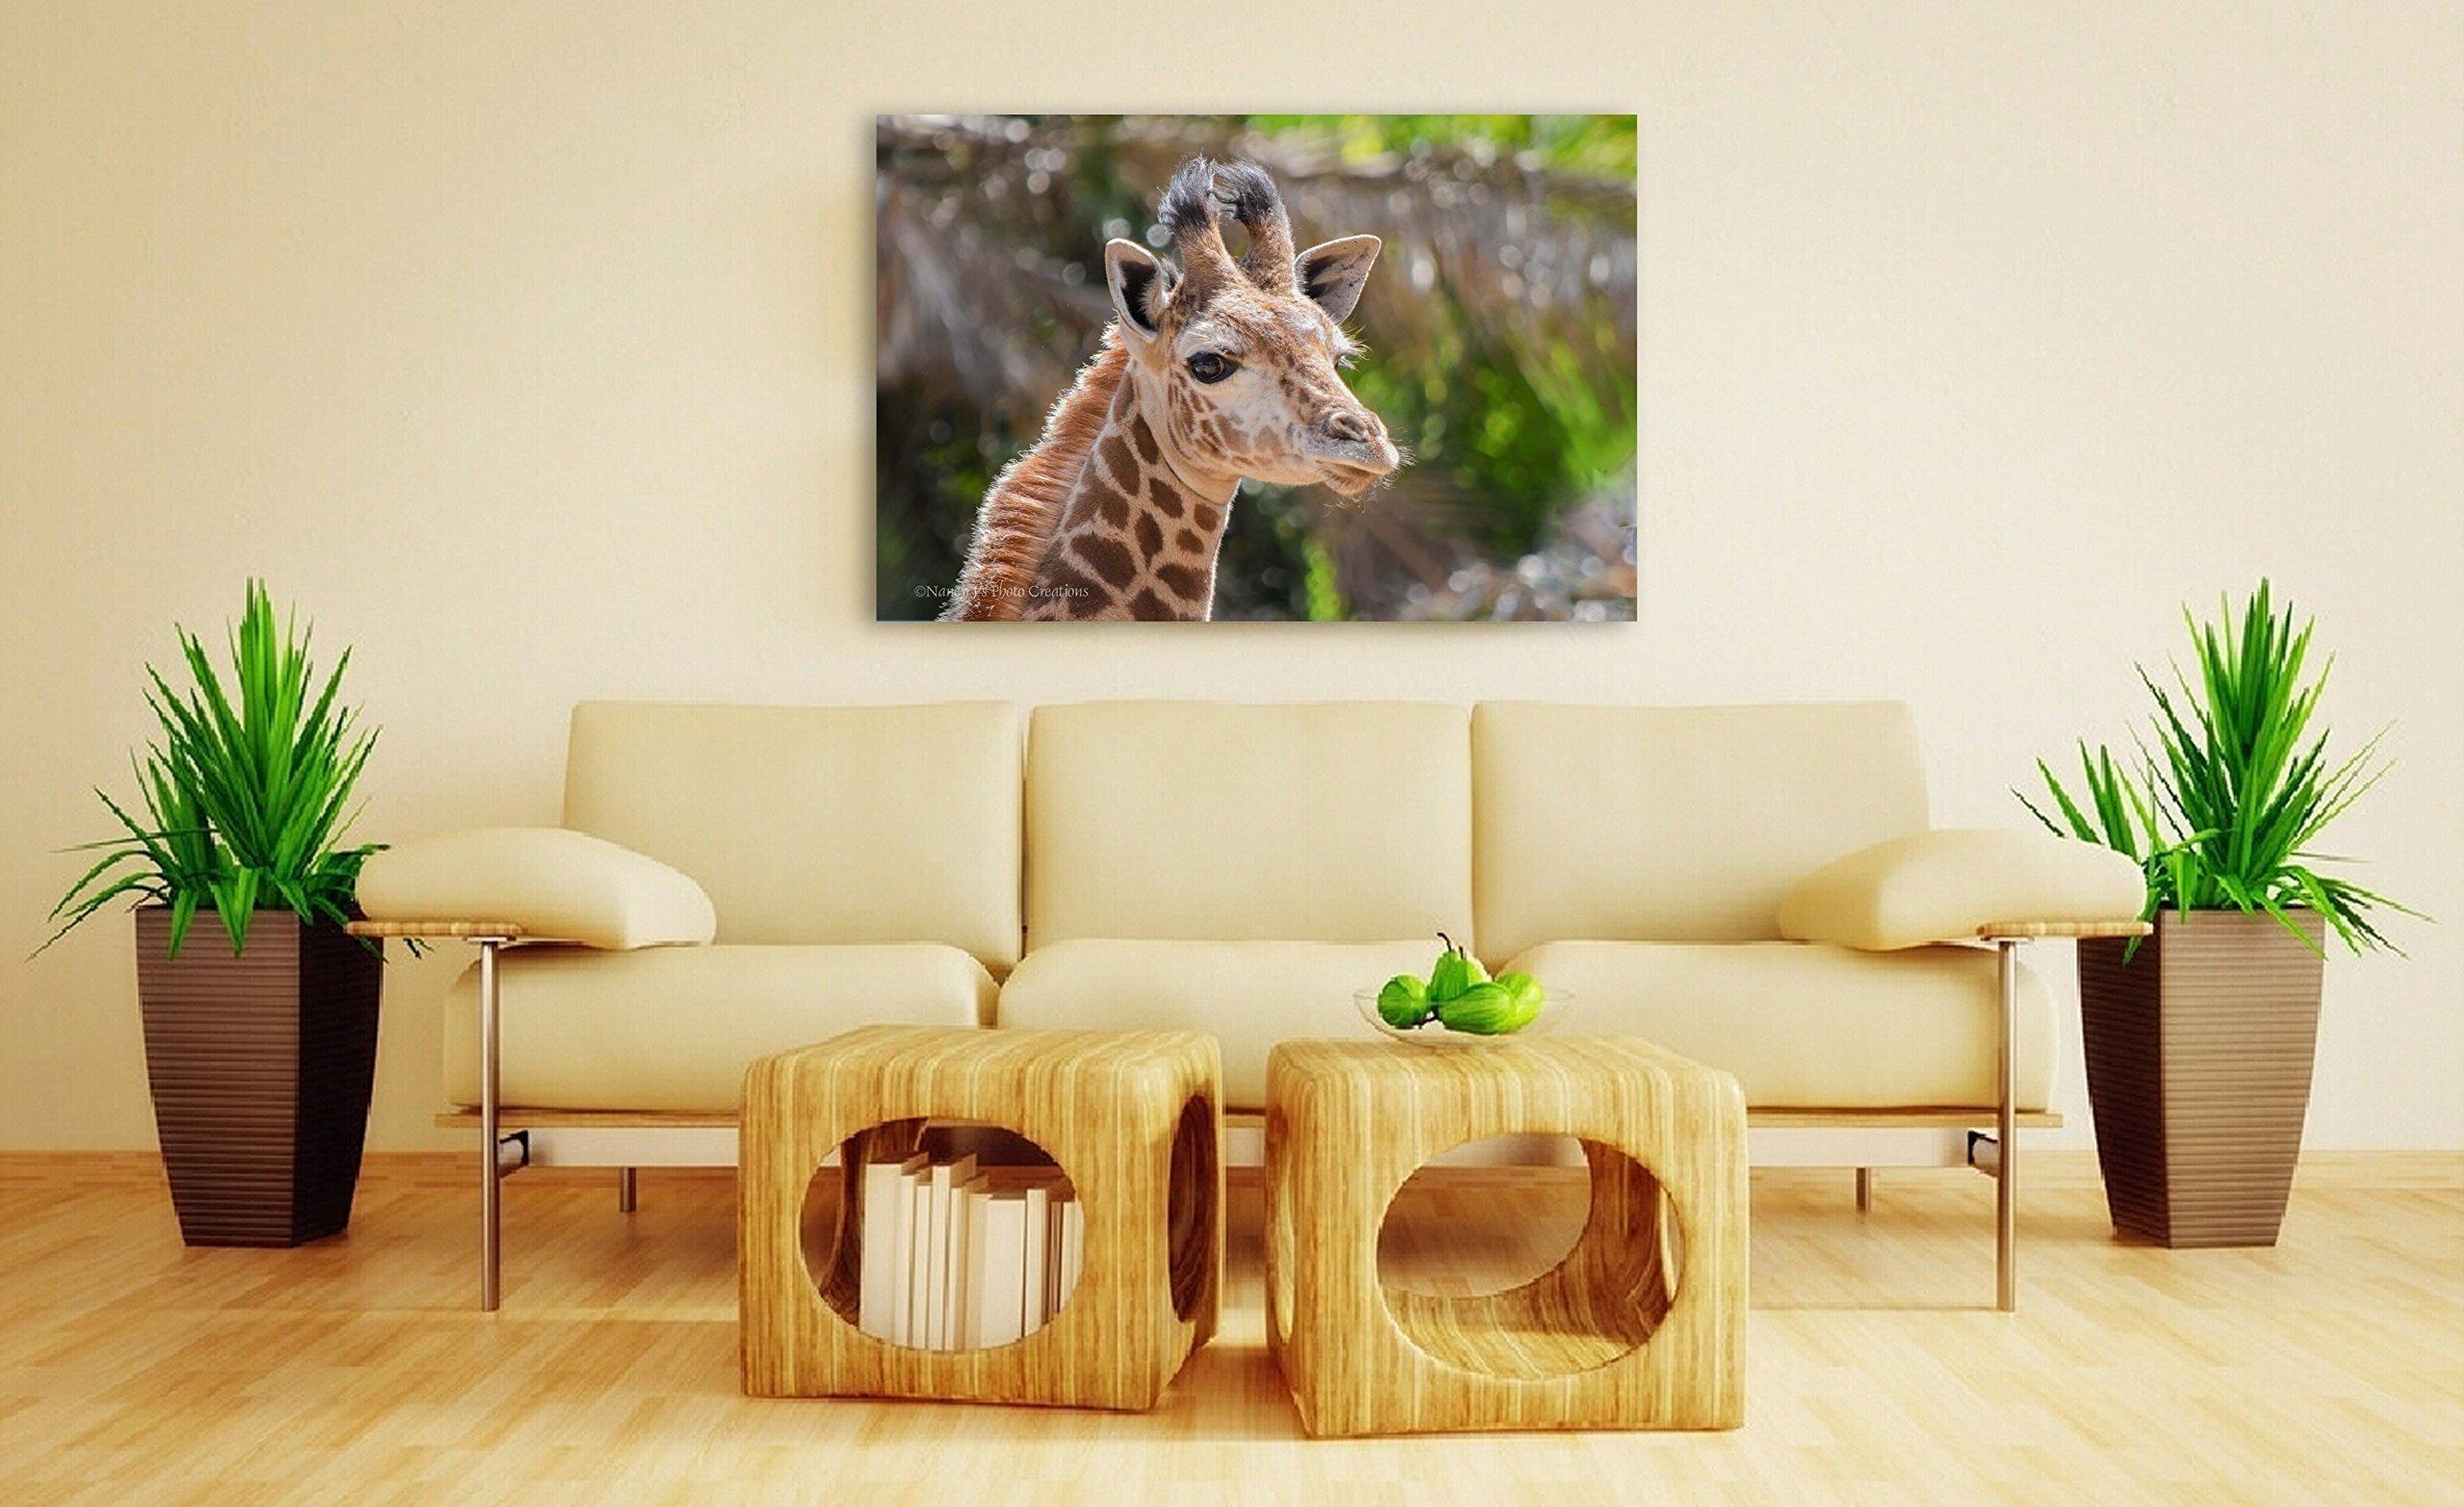 Newborn Animal Art Print on CANVAS Giraffe Photo Safari Nursery Wall Decor Baby Shower Gift Sweet Portrait Photography Ready to Hang 8x10 8x12 11x14 12x18 16x20 16x24 20x30 24x36